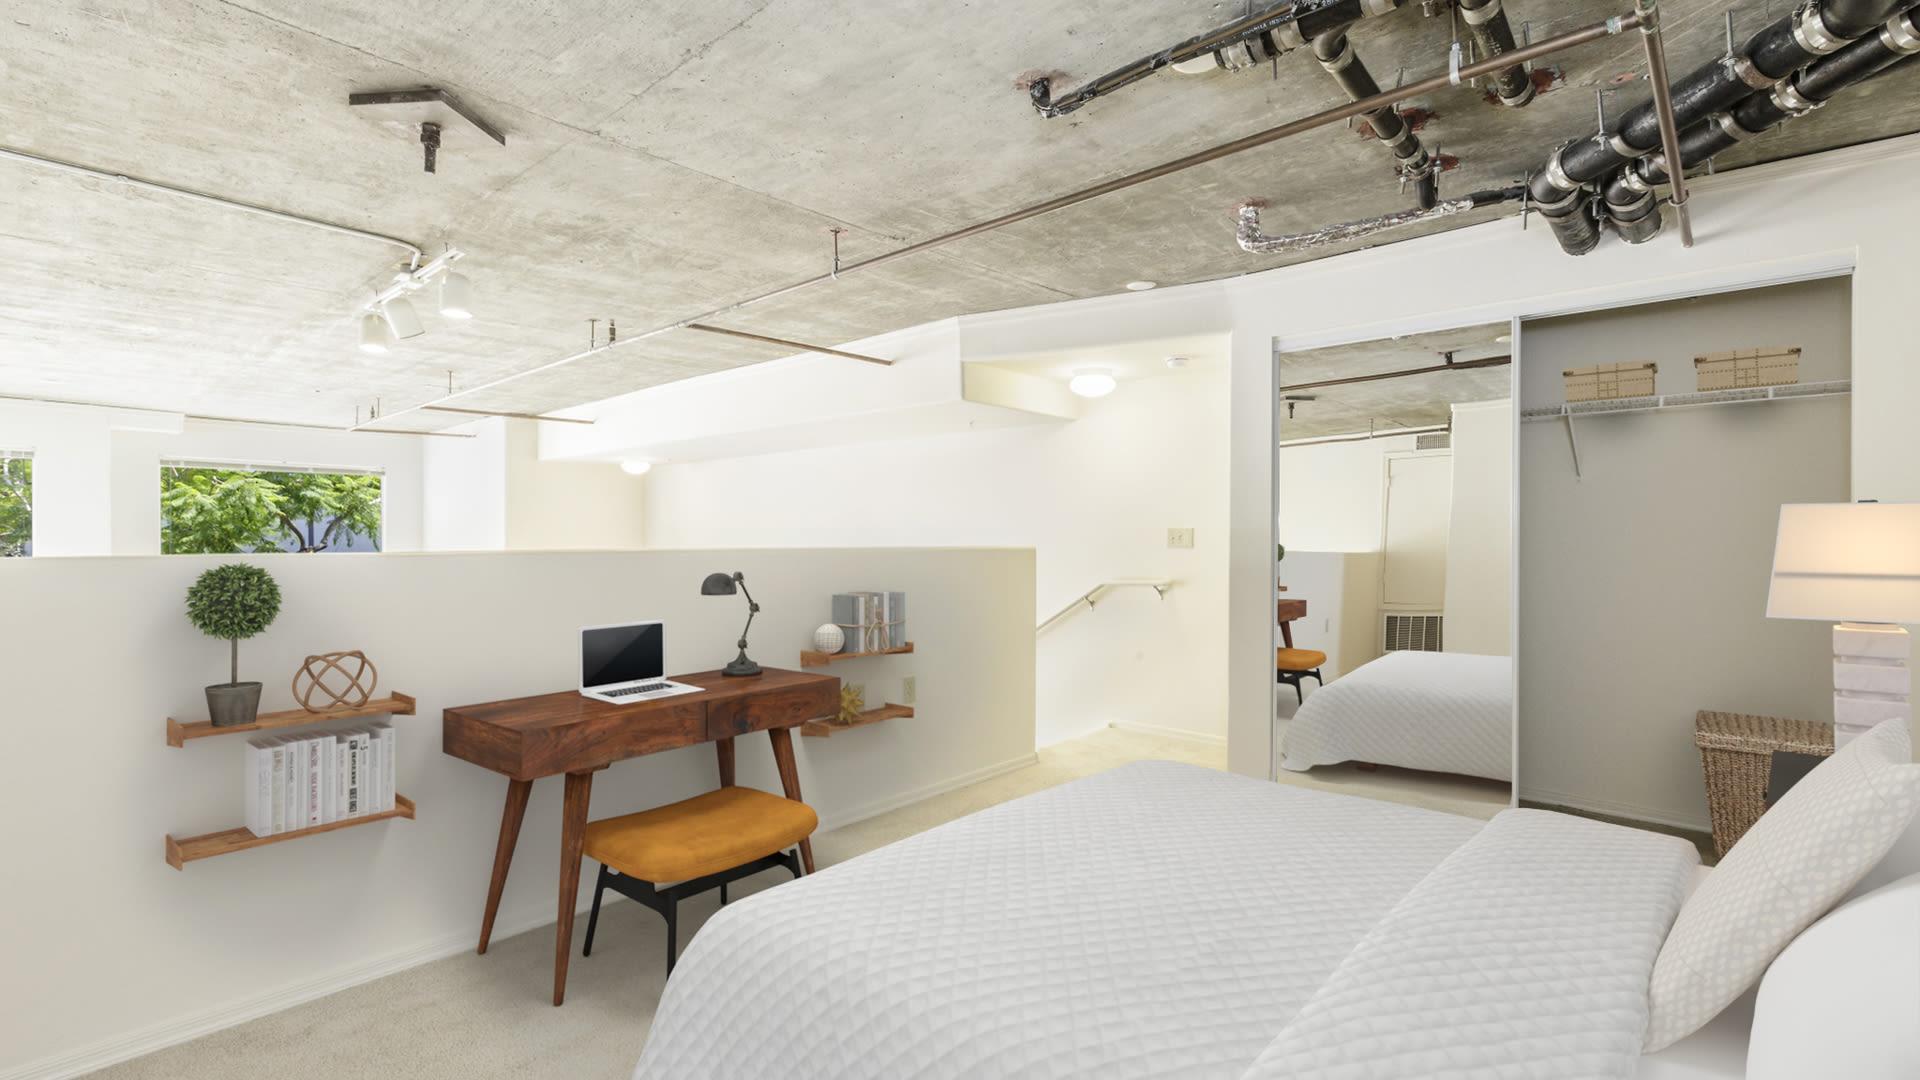 Archstone Fremont Center Apartments - Bedroom